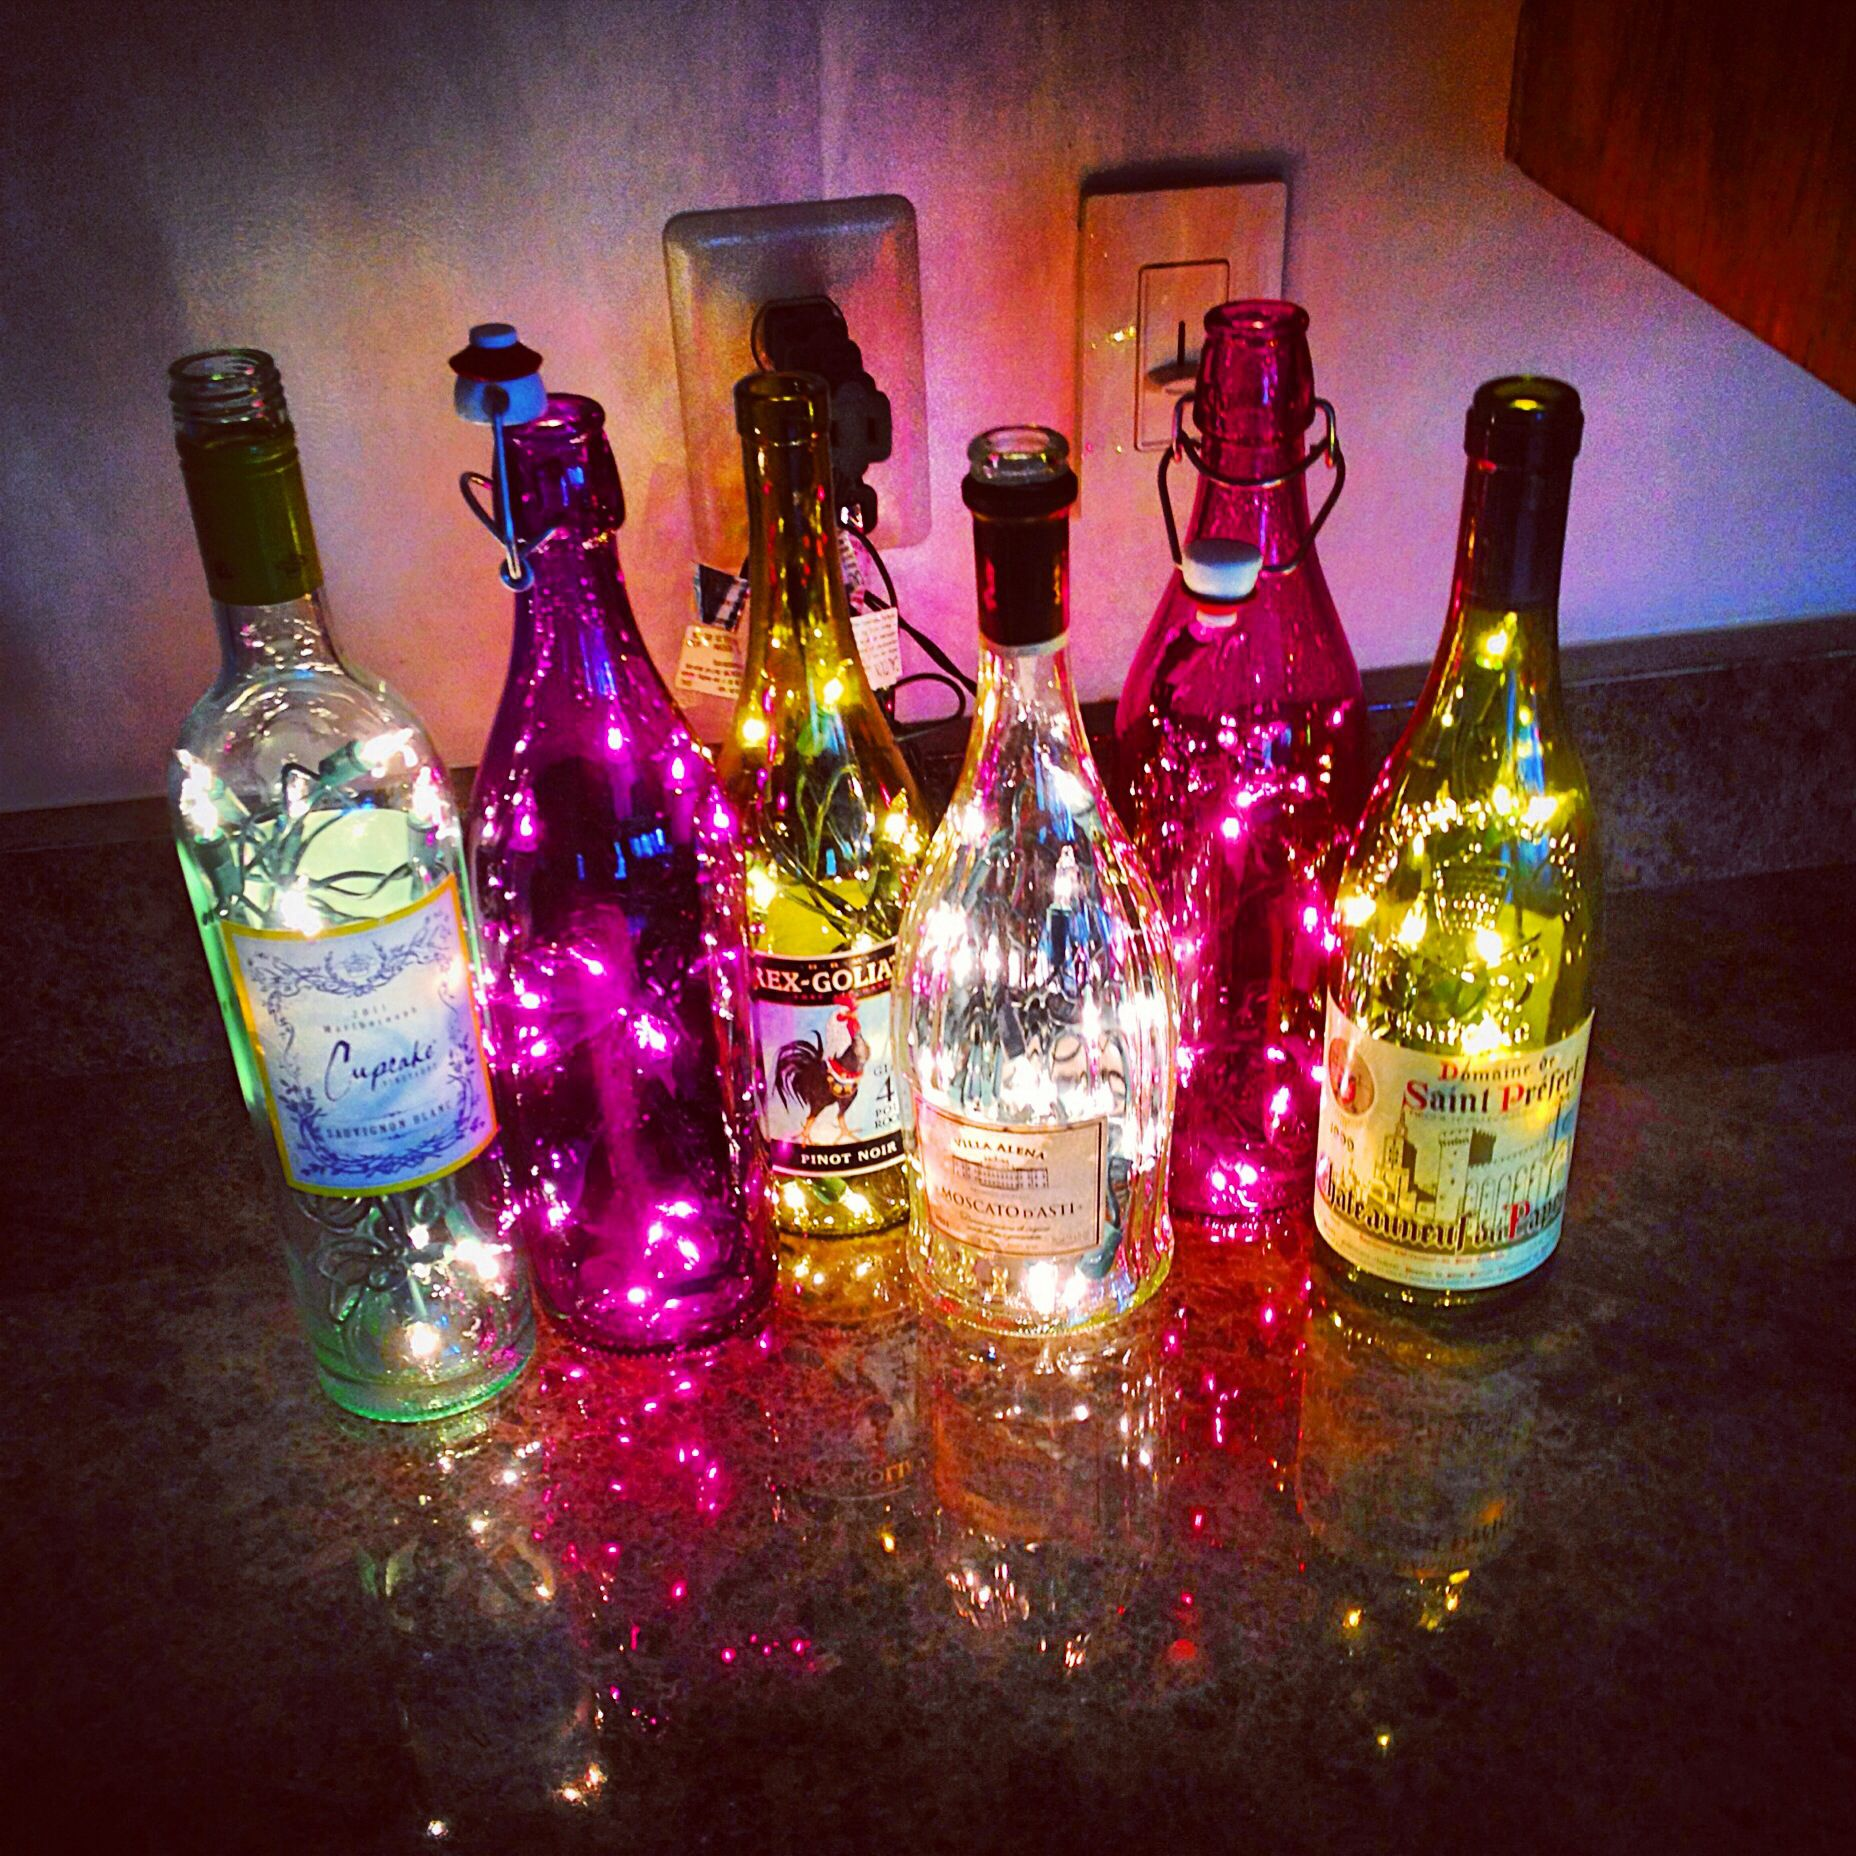 Wine Bottles Diy Smart Love The Idea Of Recycling Gorgeous Wine Bottles And The Look Wine Bottle Diy Wine Bottle Crafts Bottle Crafts